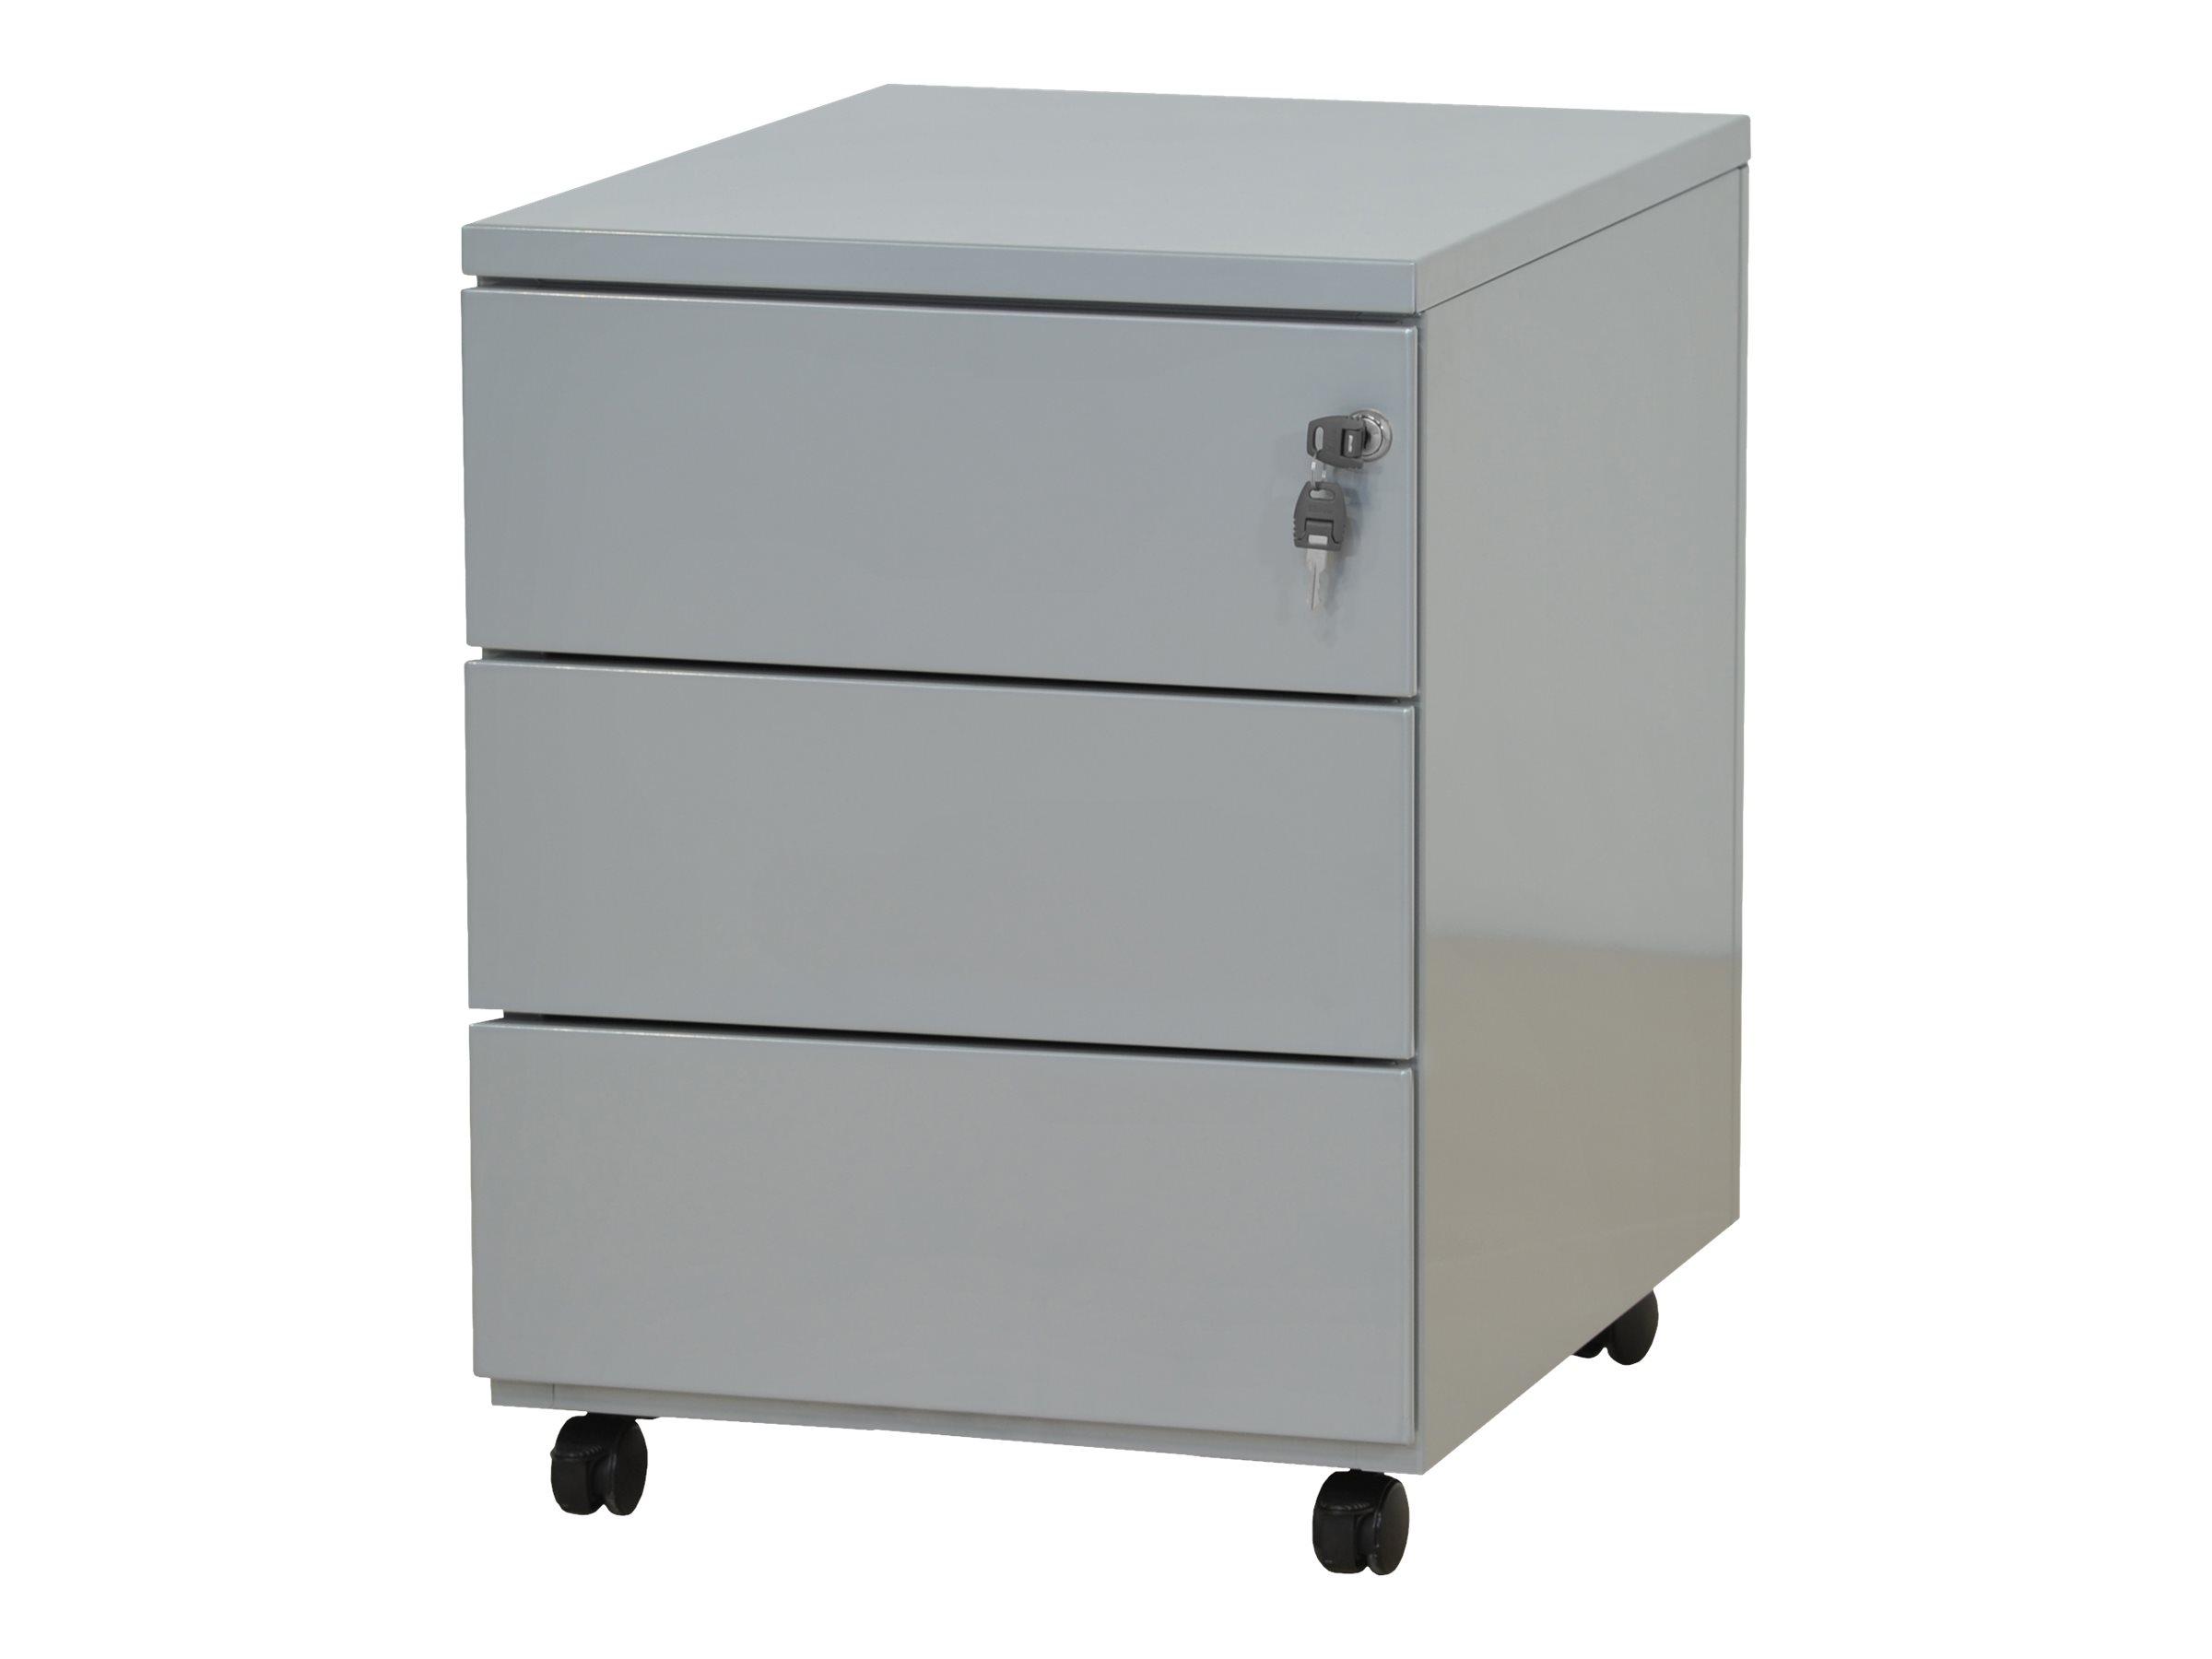 Caisson mobile - 3 tiroirs - gris - 56,7 x 54,1 x 41,8 cm